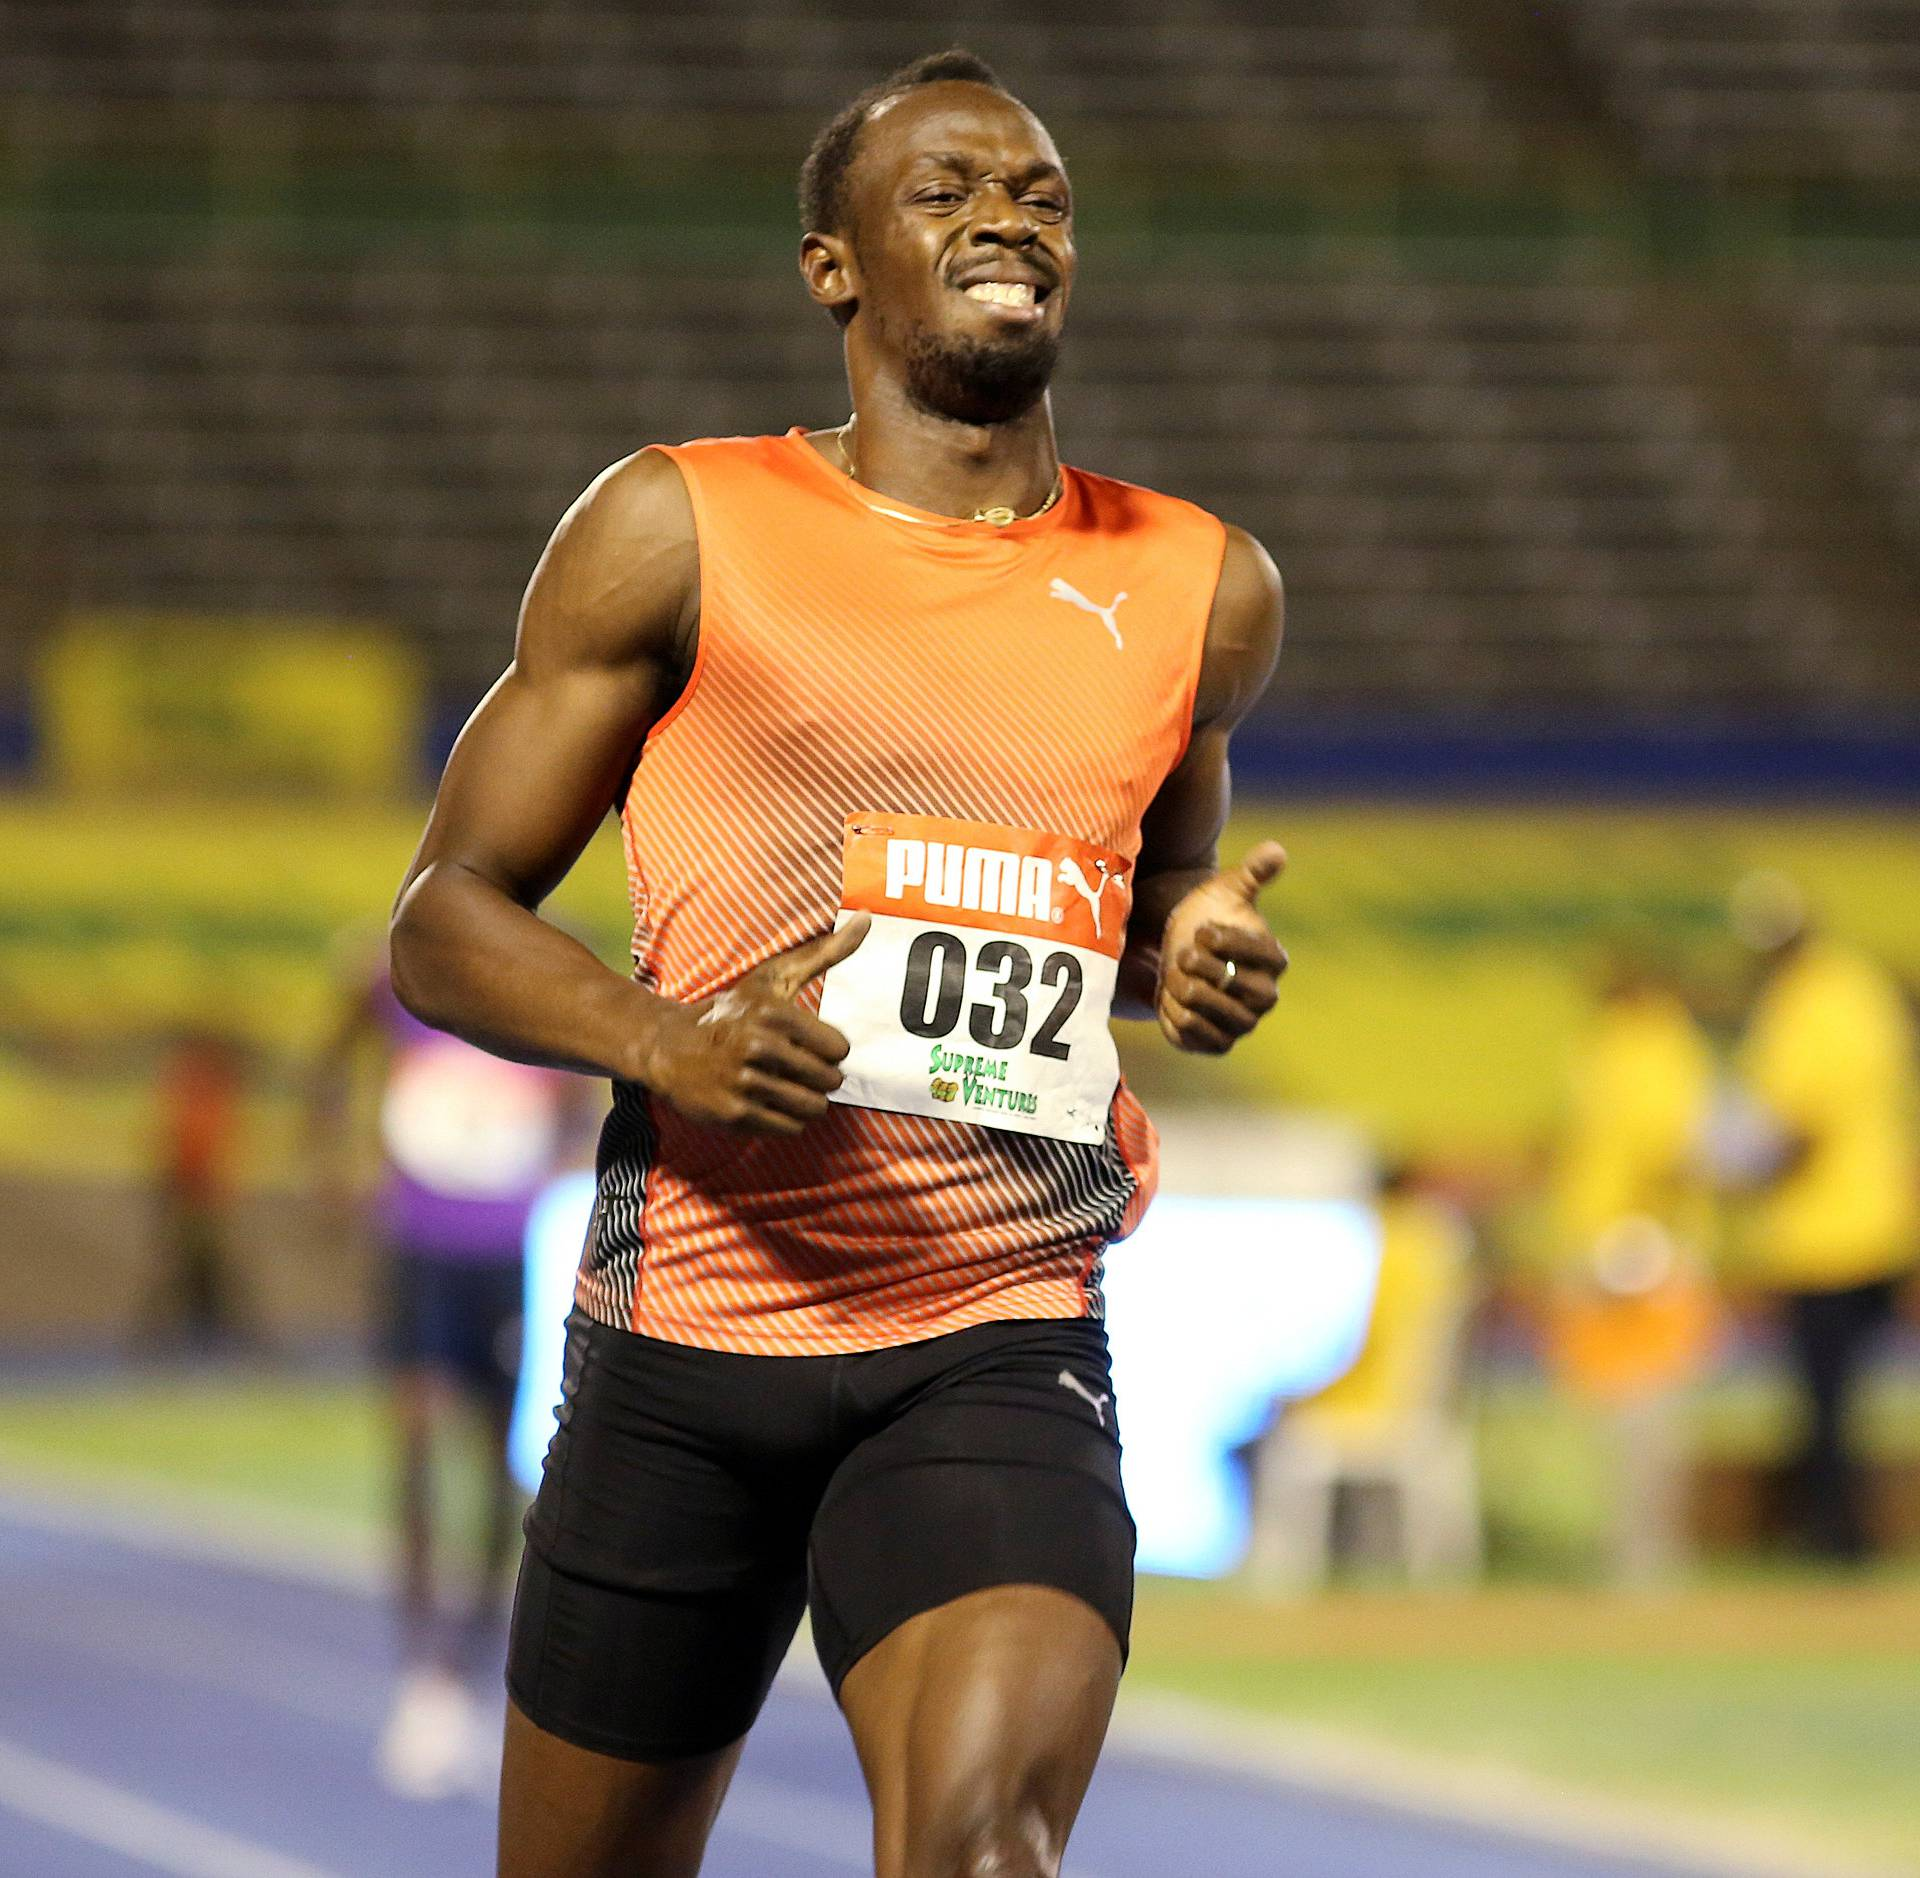 Athletics - Jamaica National Trials - Men's 100m - Kingston